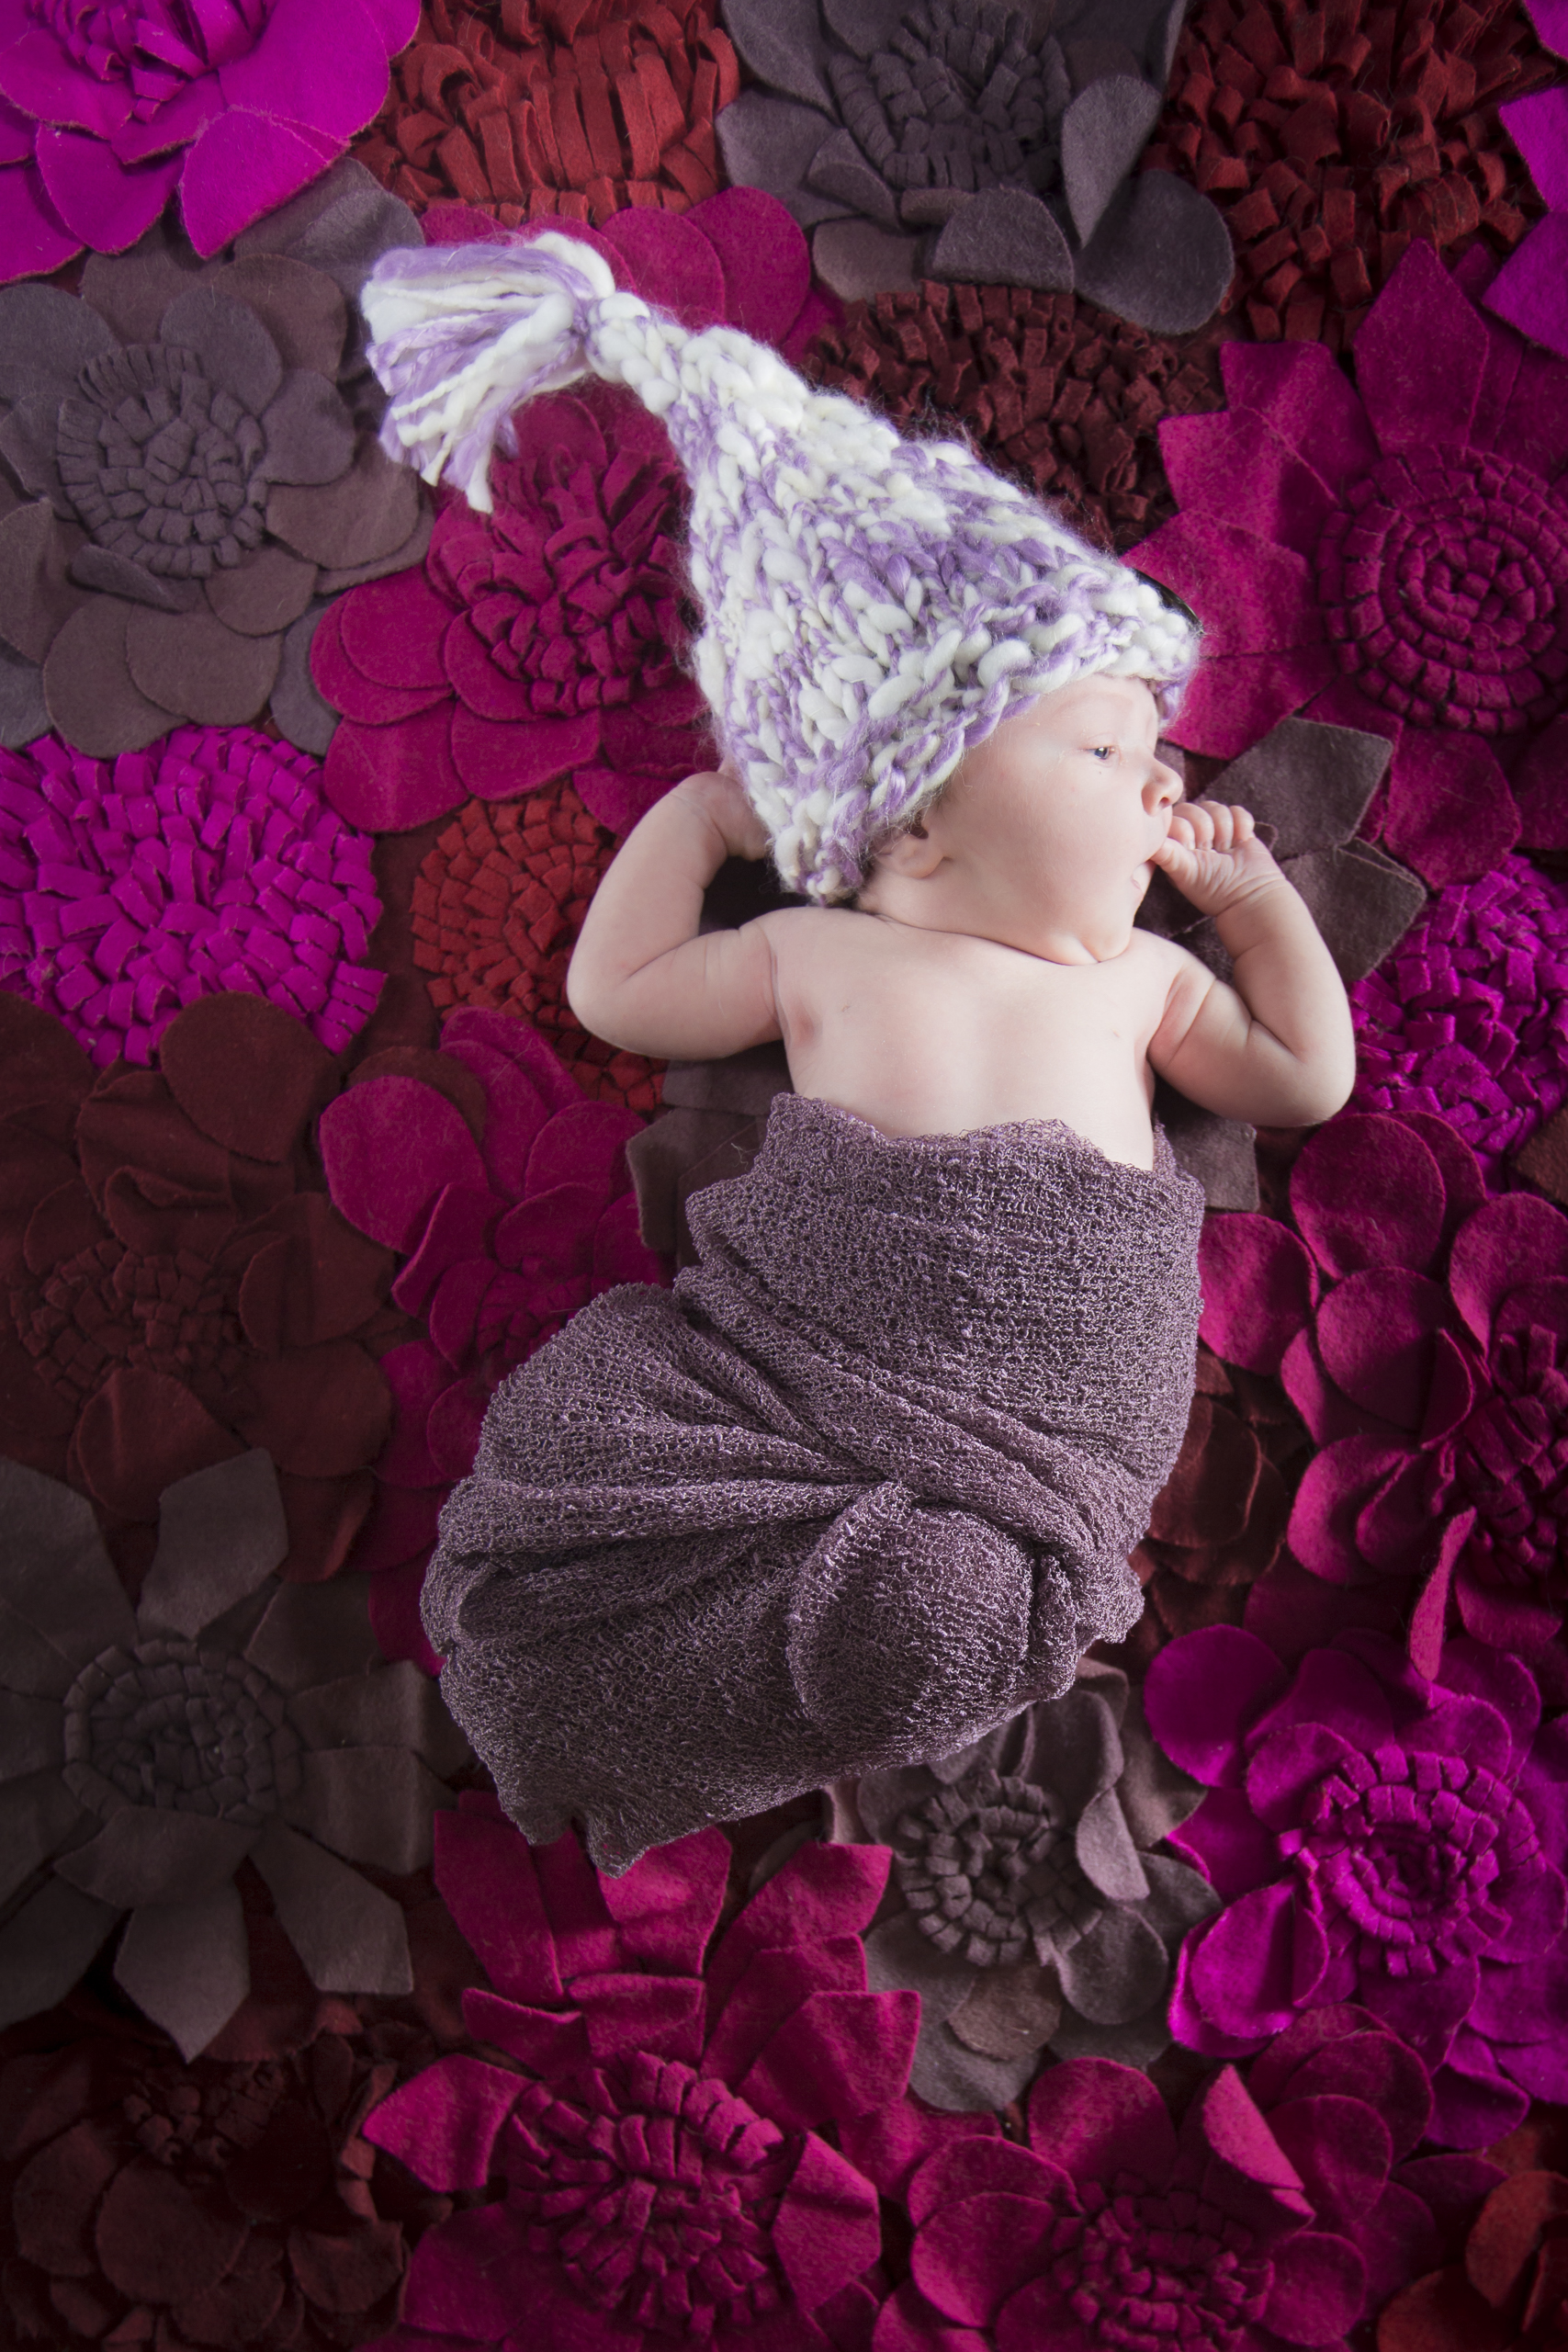 09 newborn girl purple swaddle knit hat flower felt rug studio photography session 2.jpg